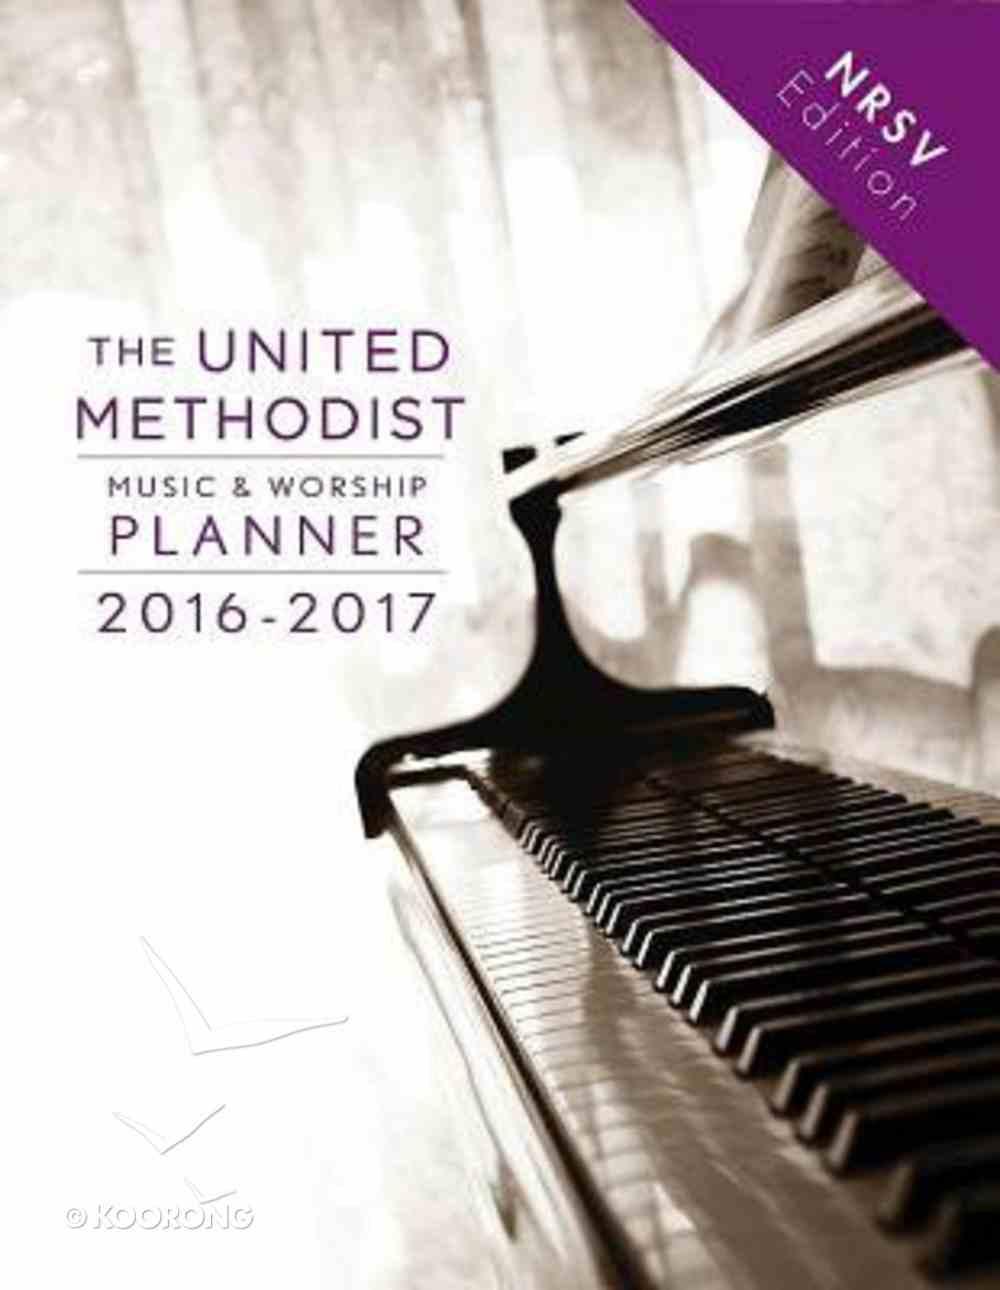 The United Methodist Music & Worship Planner 2016-2017 (Nrsv Edition) Spiral